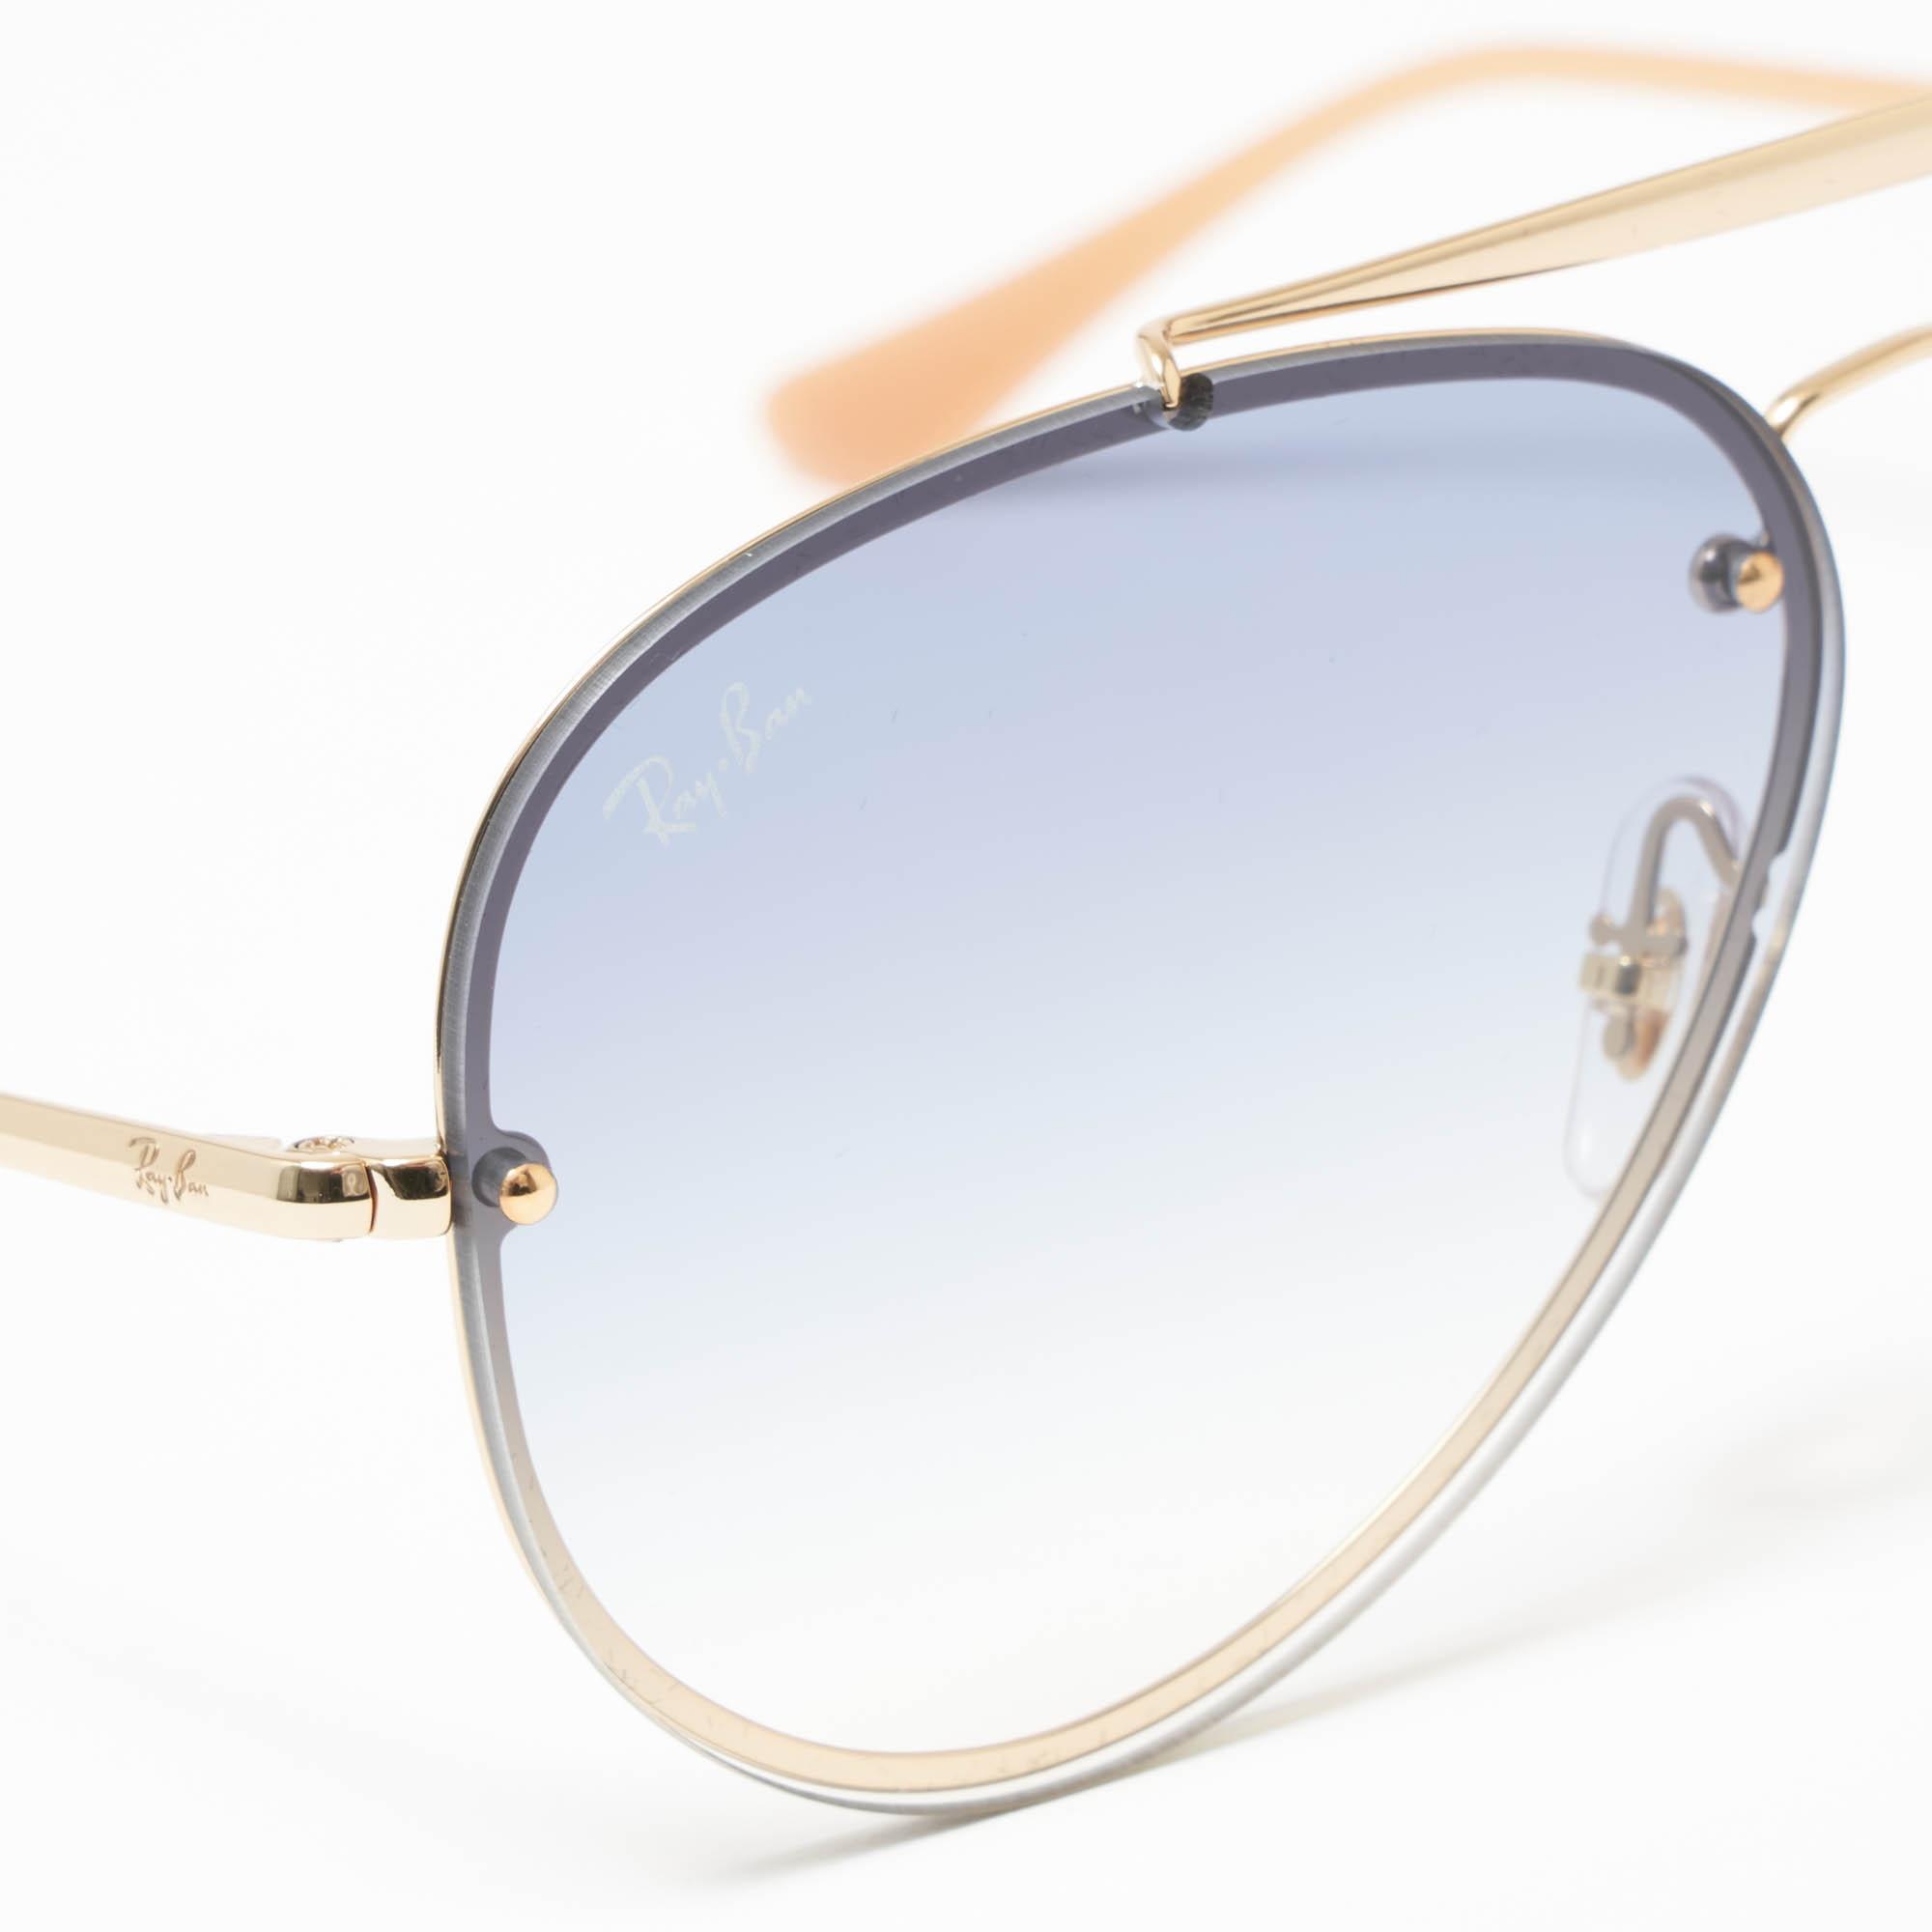 d9f6b8aeac5 Ray-Ban - Metallic Gold Blaze Aviator Sunglasses - Light Blue Gradient  Lenses for Men. View fullscreen